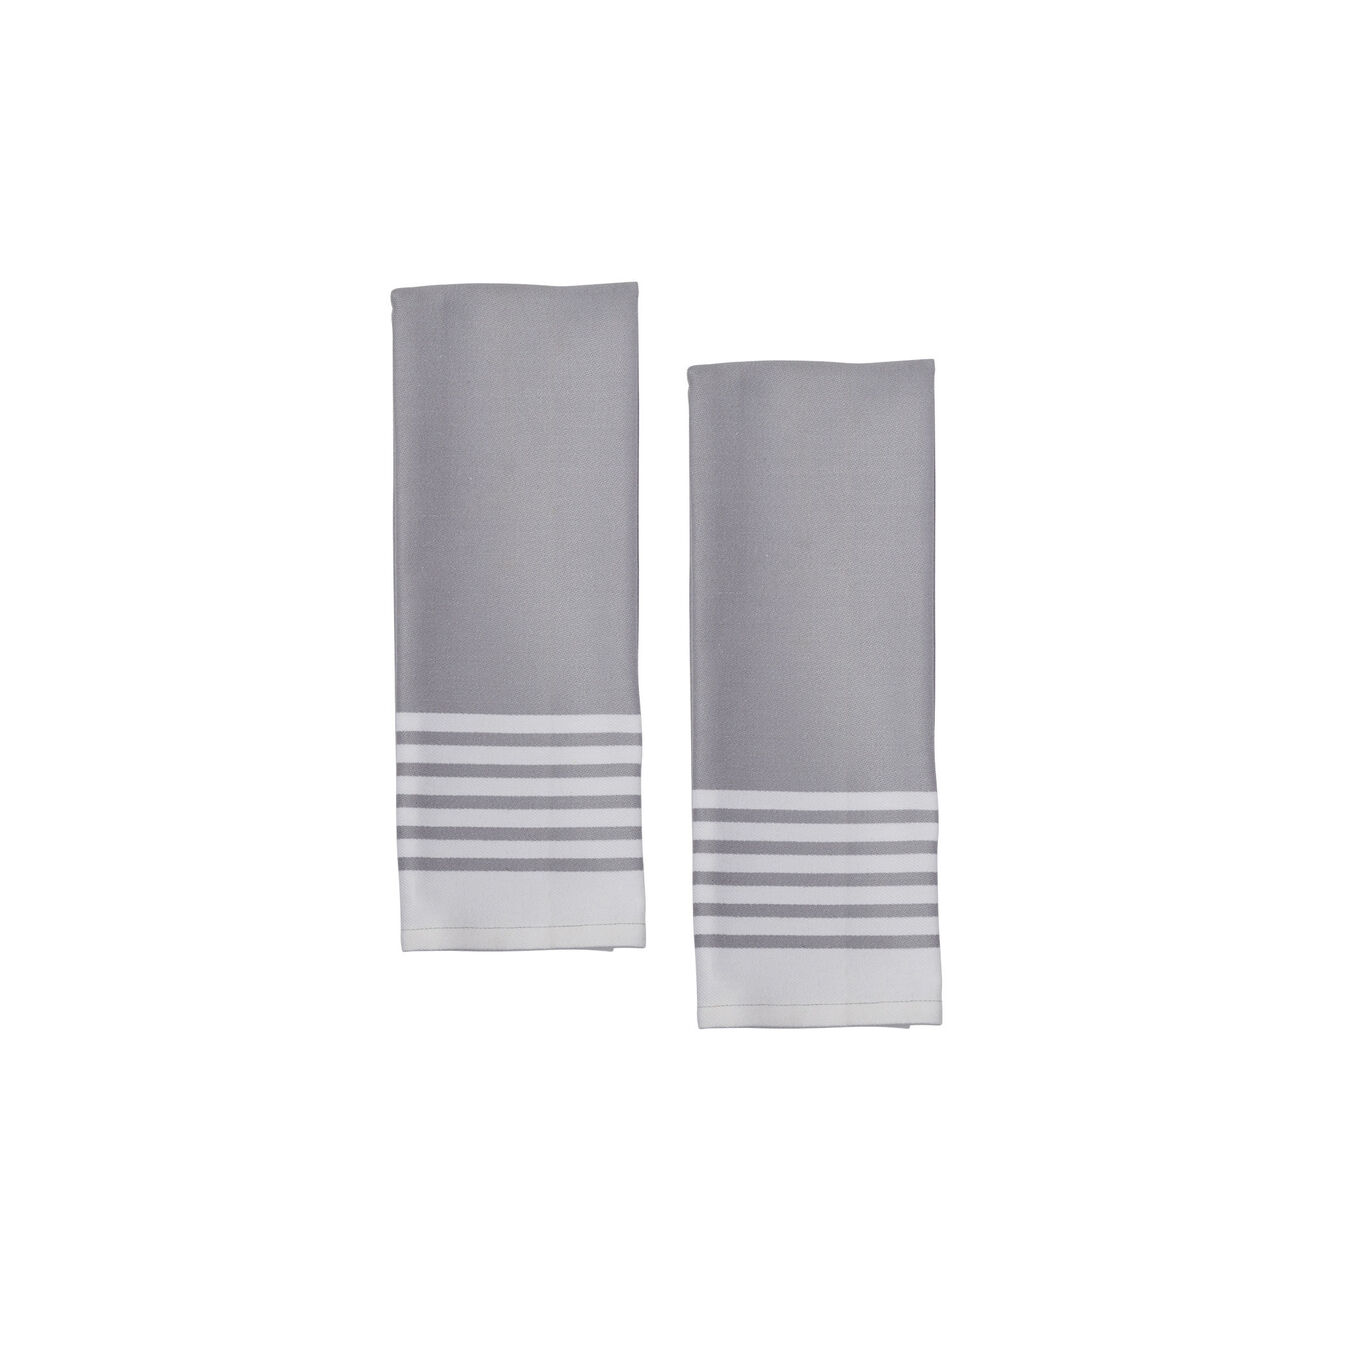 4-pc Kitchen Towel Set - Grey,,large 2